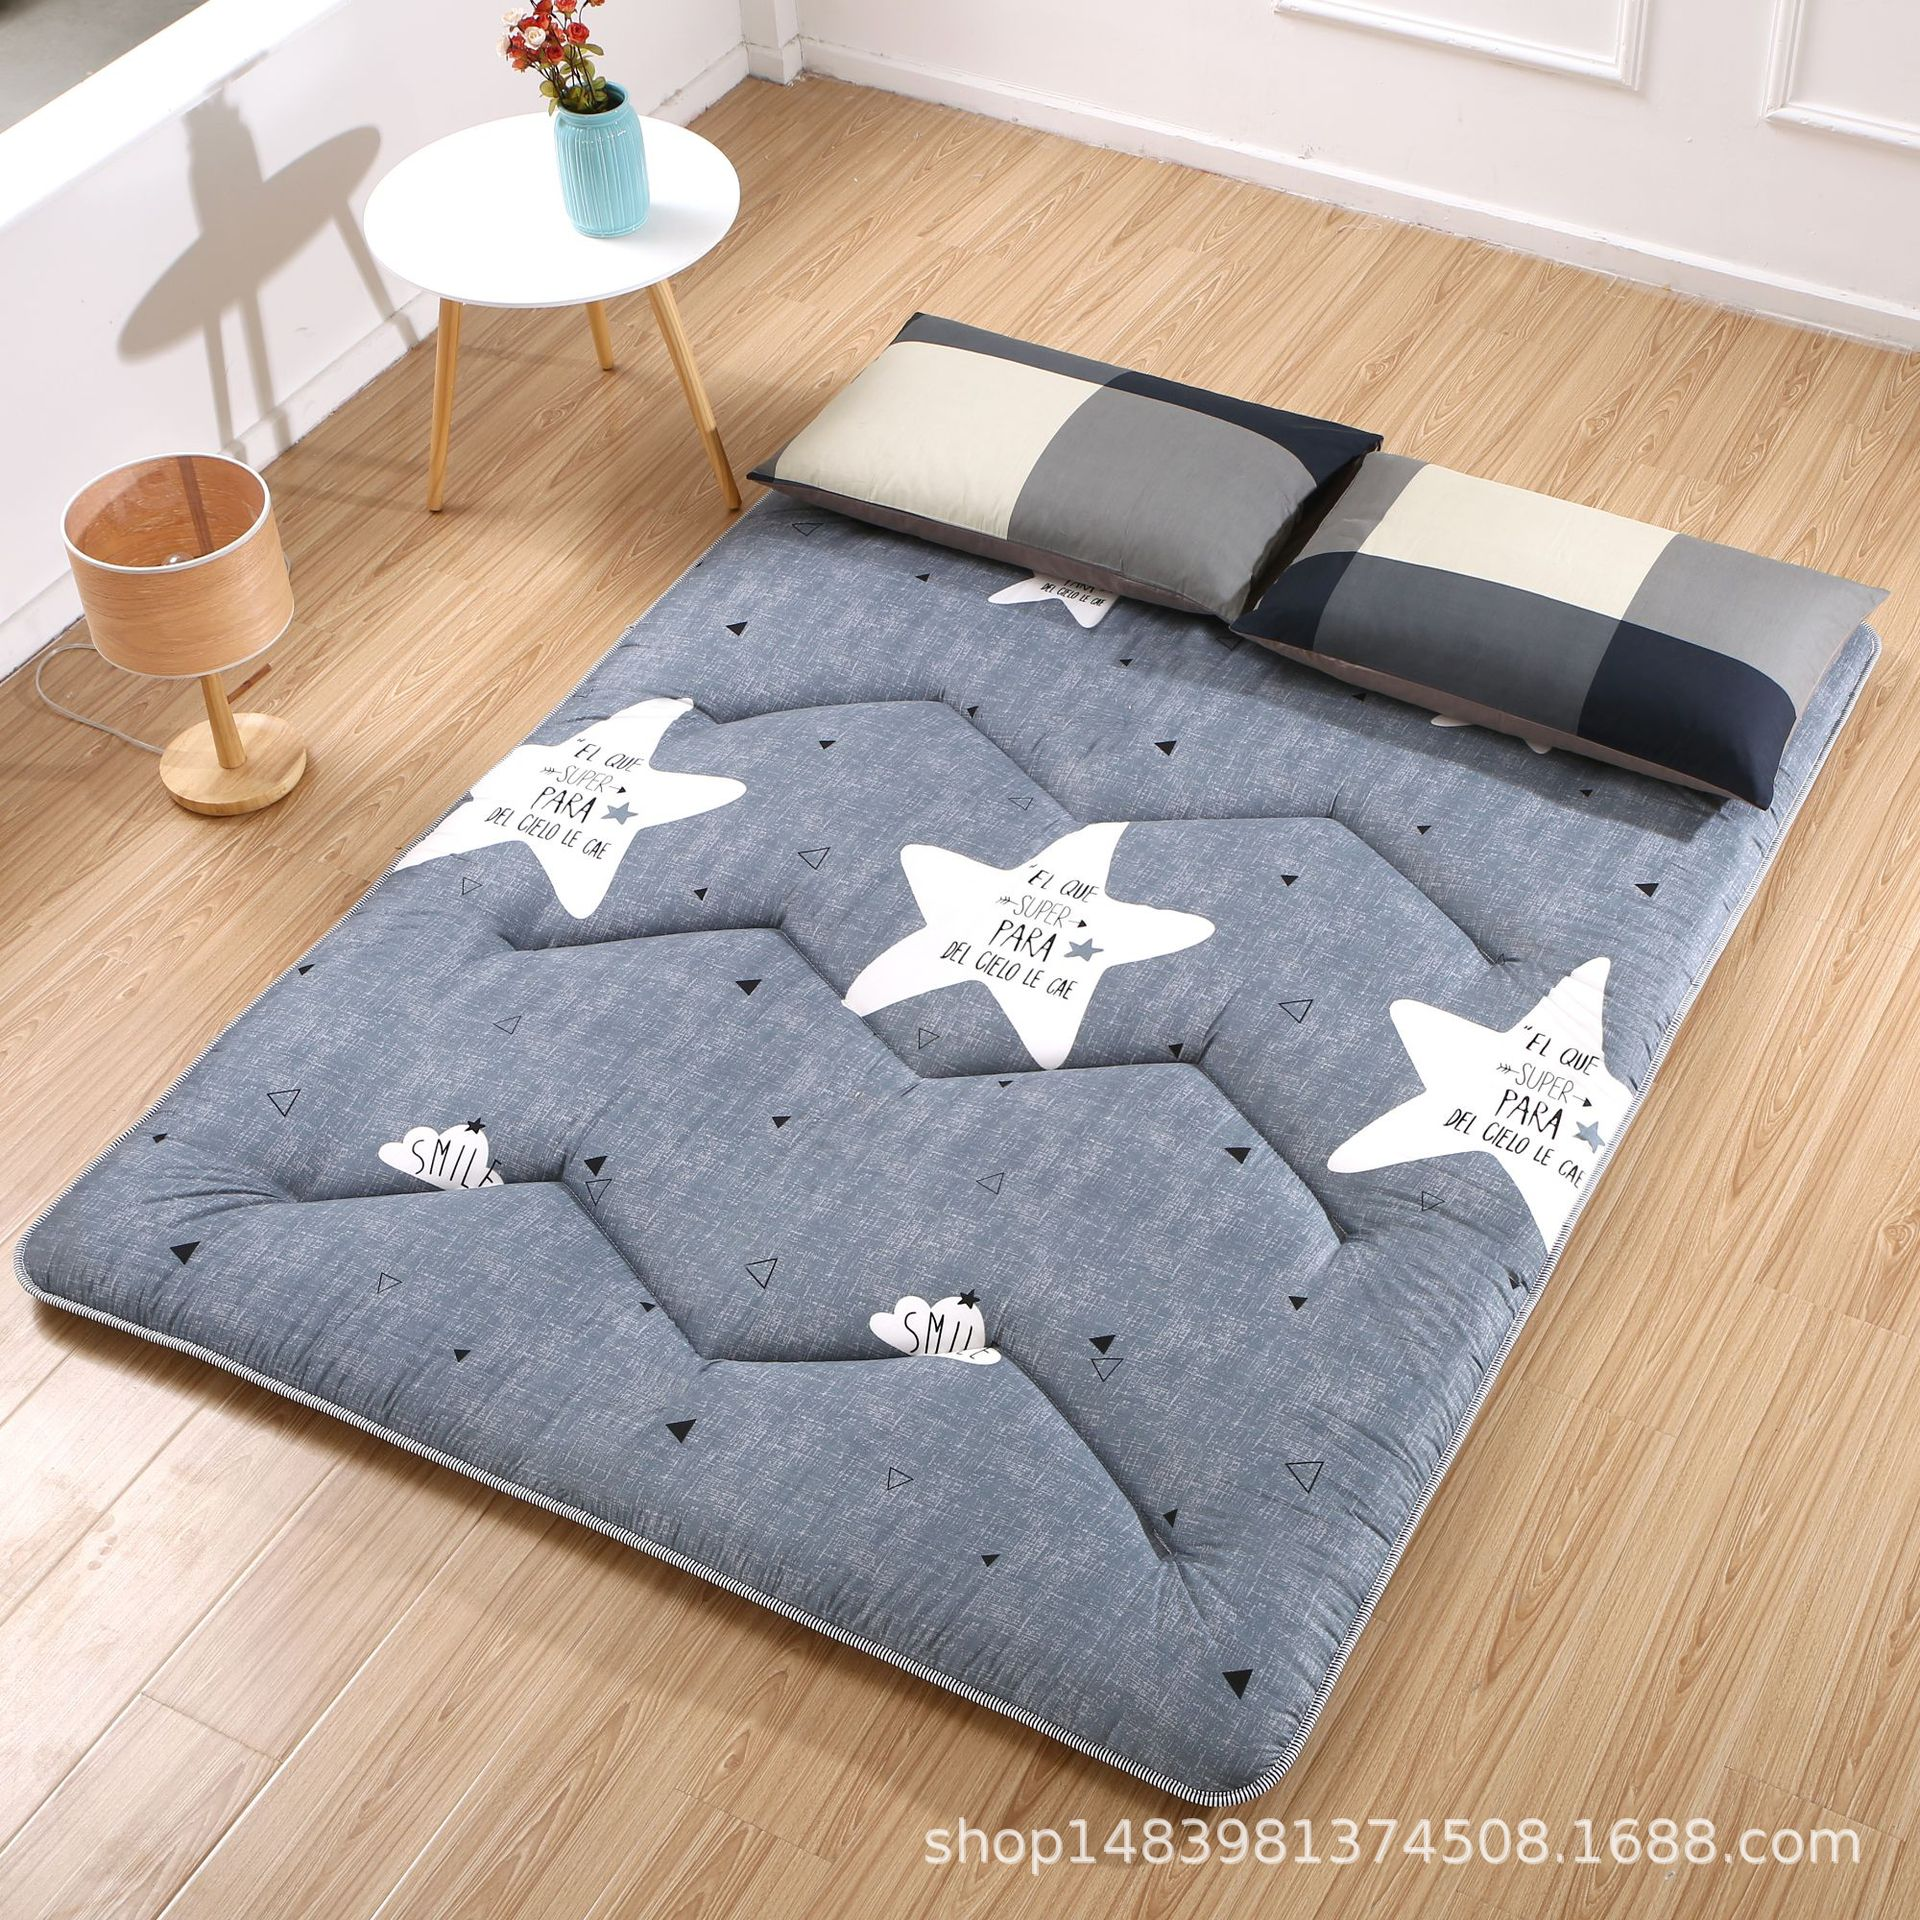 Non-slip Sleeping Mattress Household Hotel Bedding Protection Pad Student Folding Tatami Mattresses Floor Ground Sleeping Mat